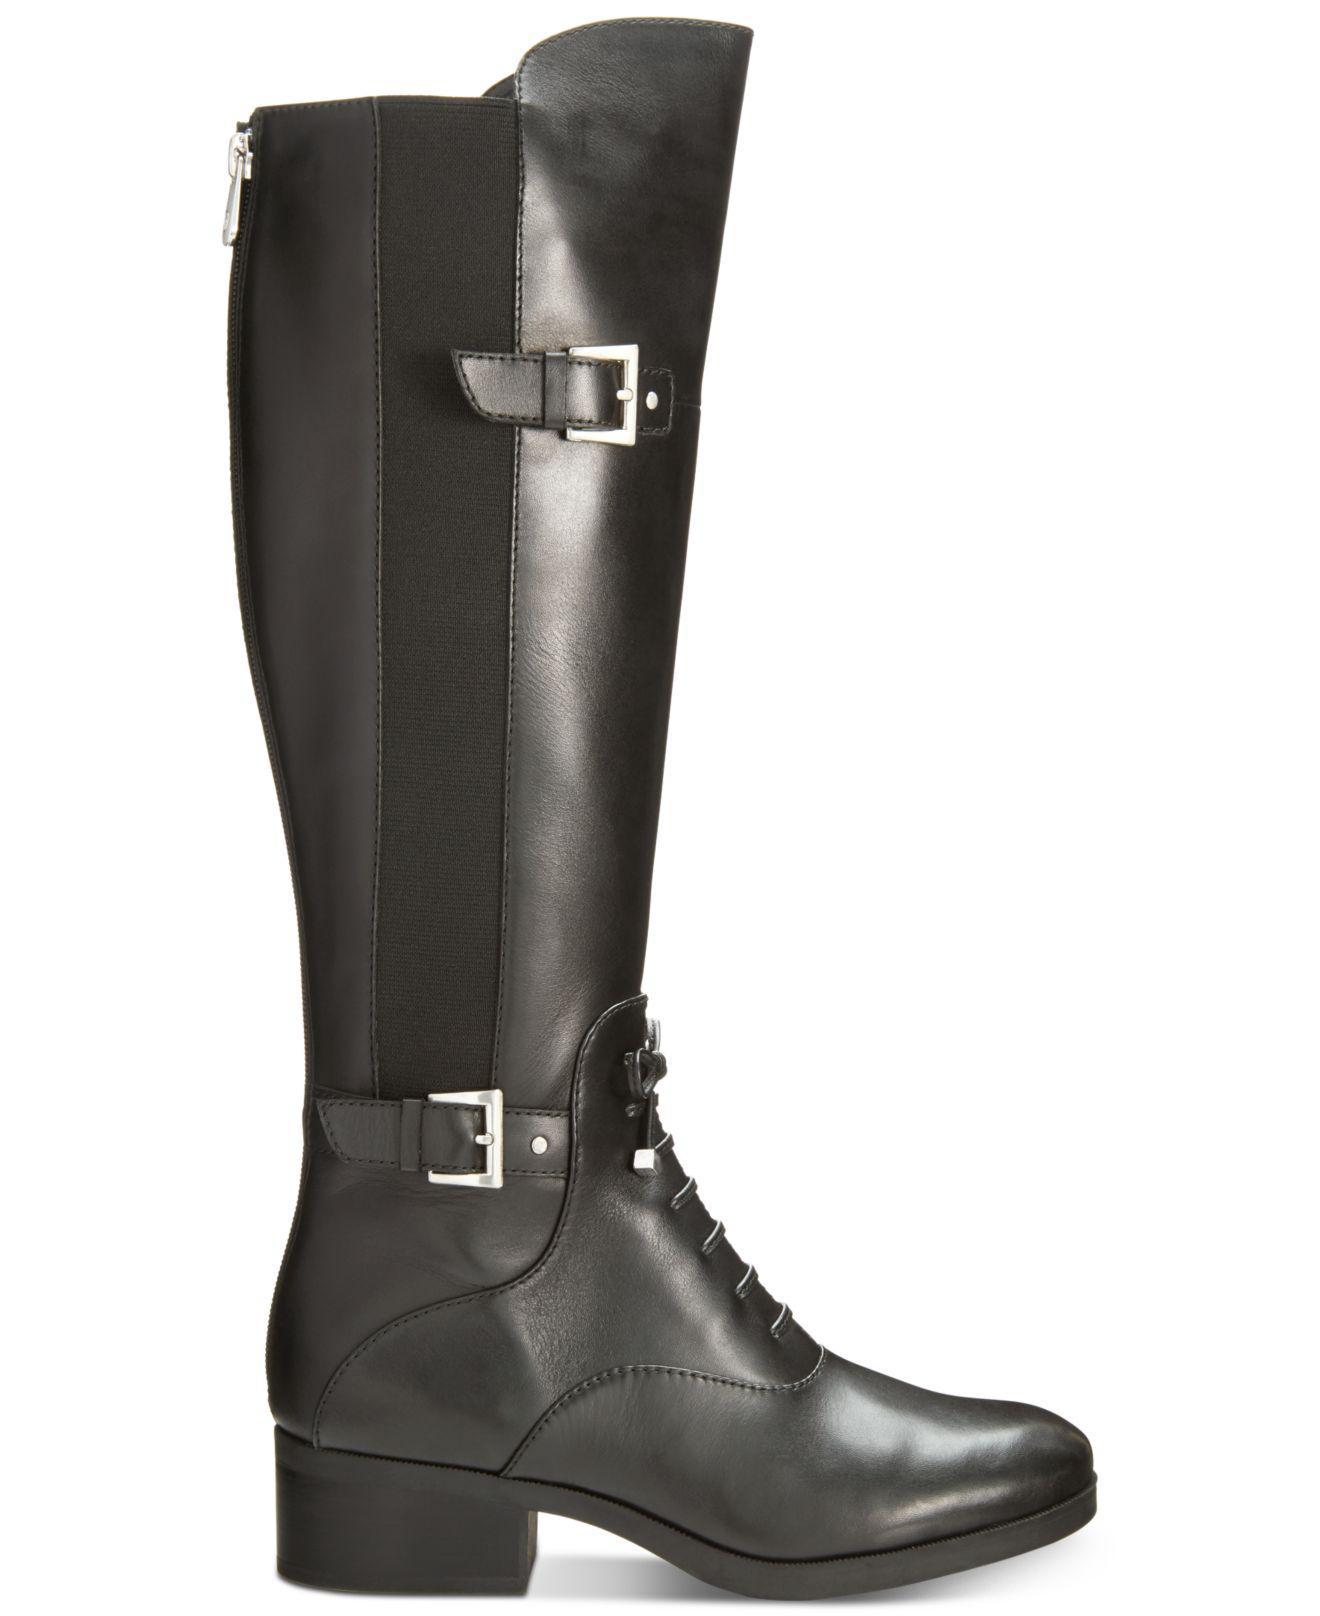 9aef5292e17 Lyst - Adrienne Vittadini Moshiko Riding Boots in Black